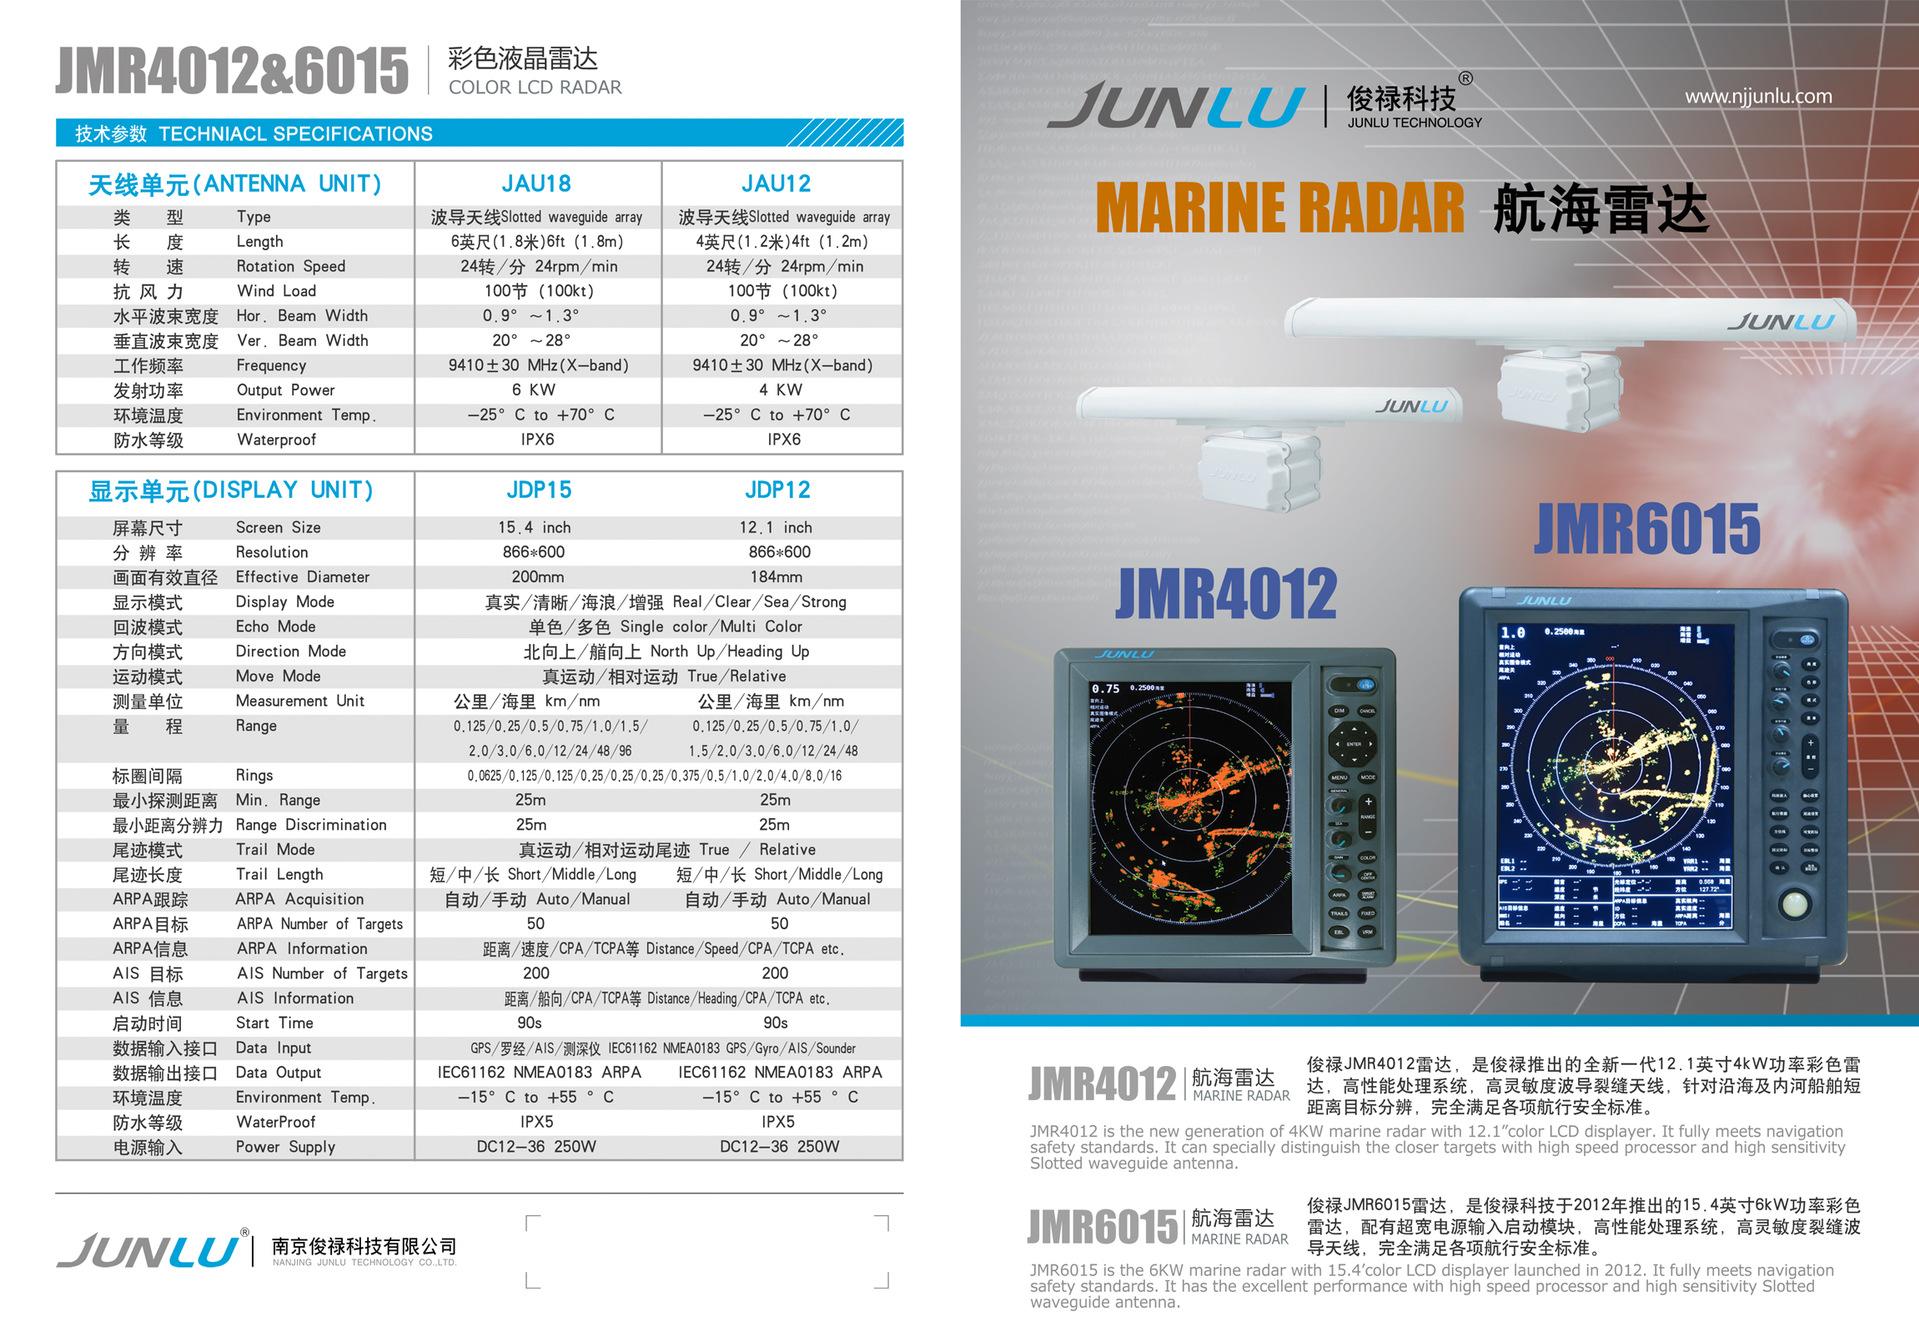 JMR4012-6015 A